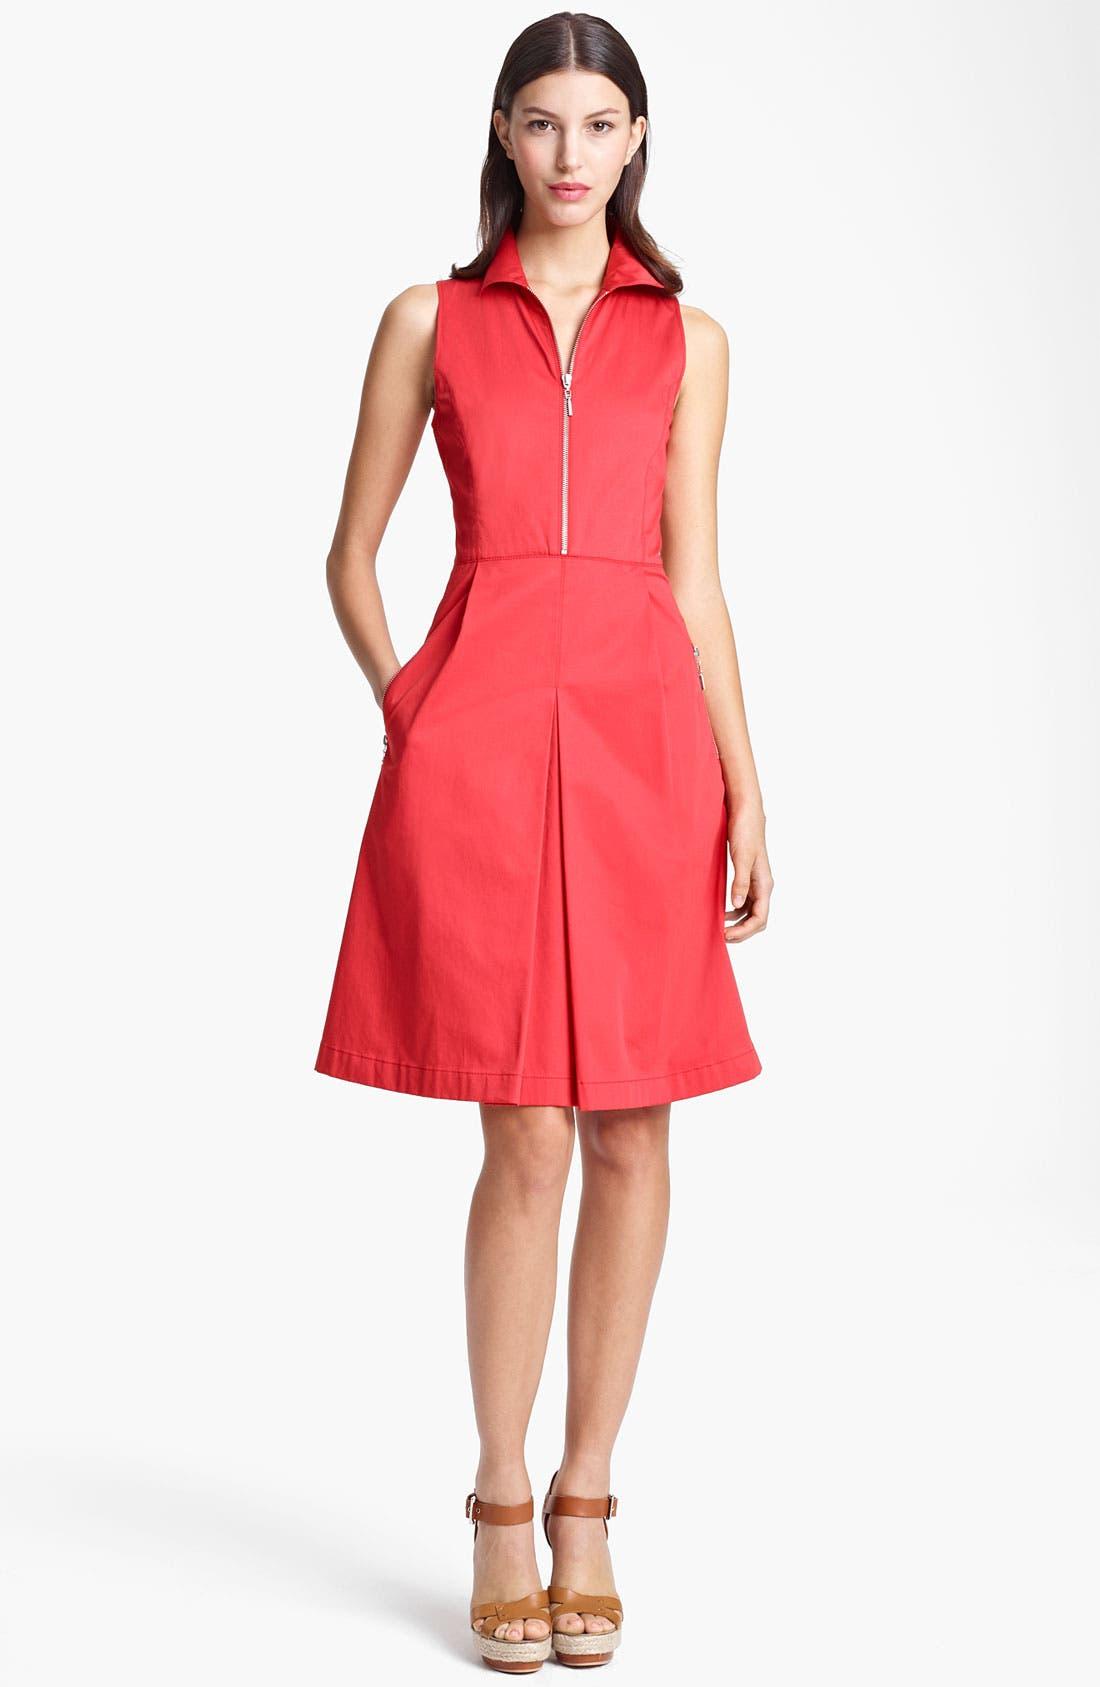 Alternate Image 1 Selected - Armani Collezioni Zip Front A-Line Dress